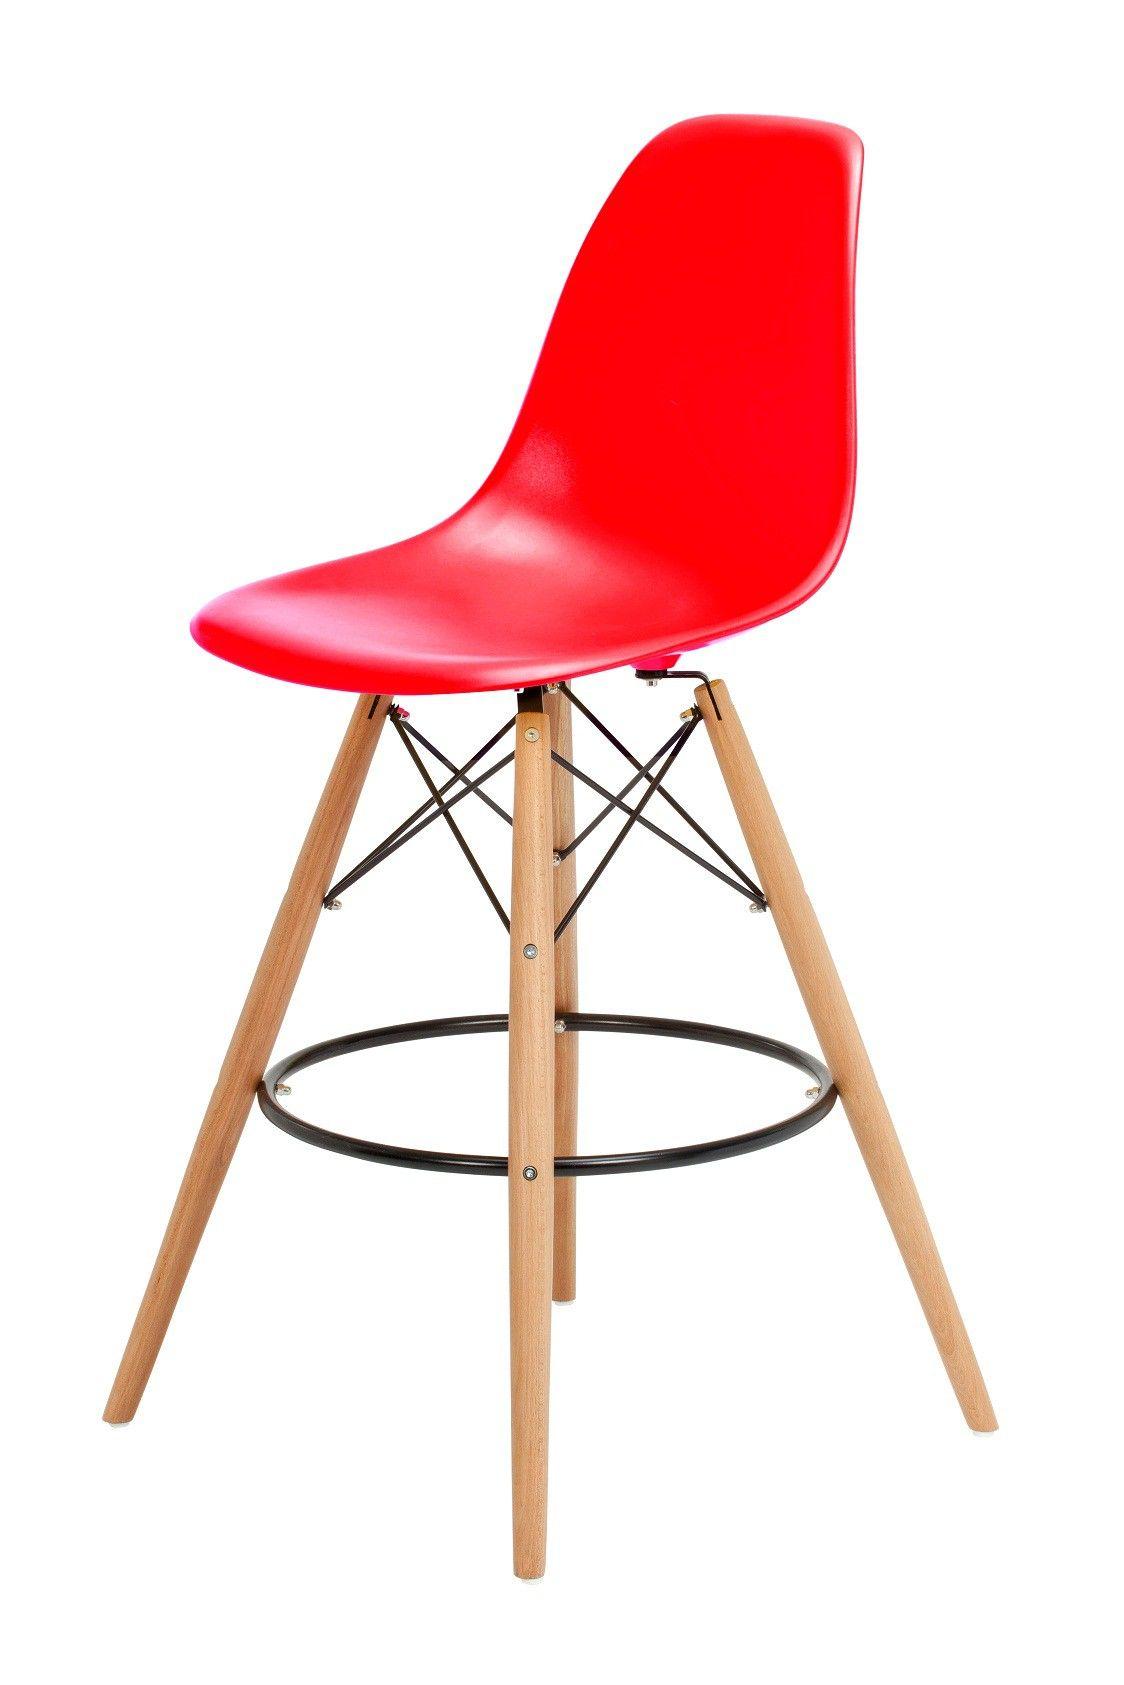 Replica Charles Eames style Bar Stool This replica